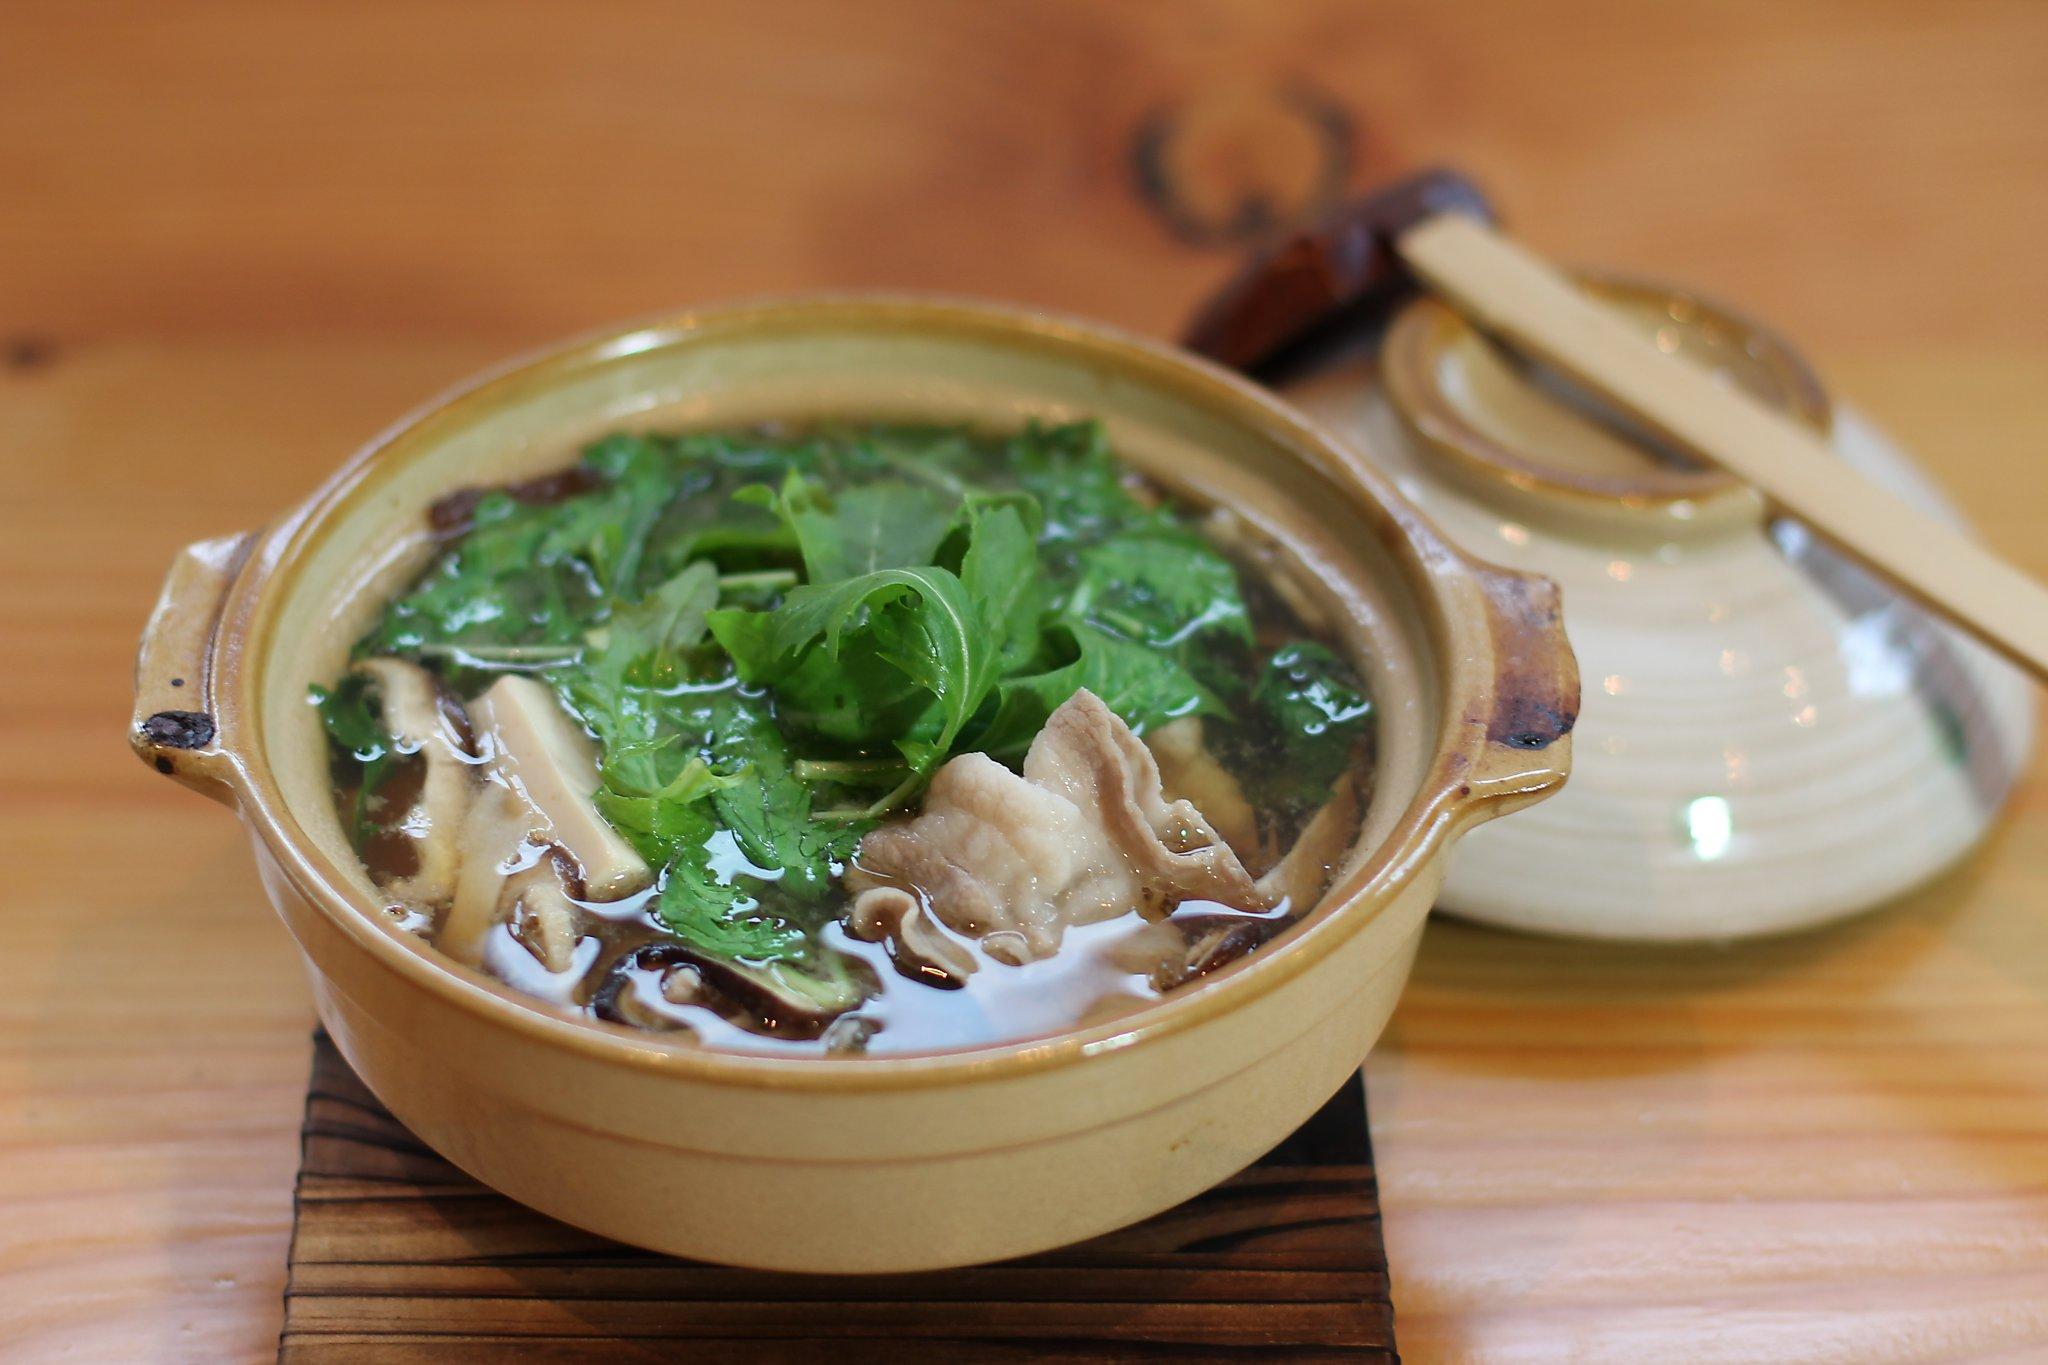 Fish & Bird restaurant brings modern Japanese flavors to Berkeley